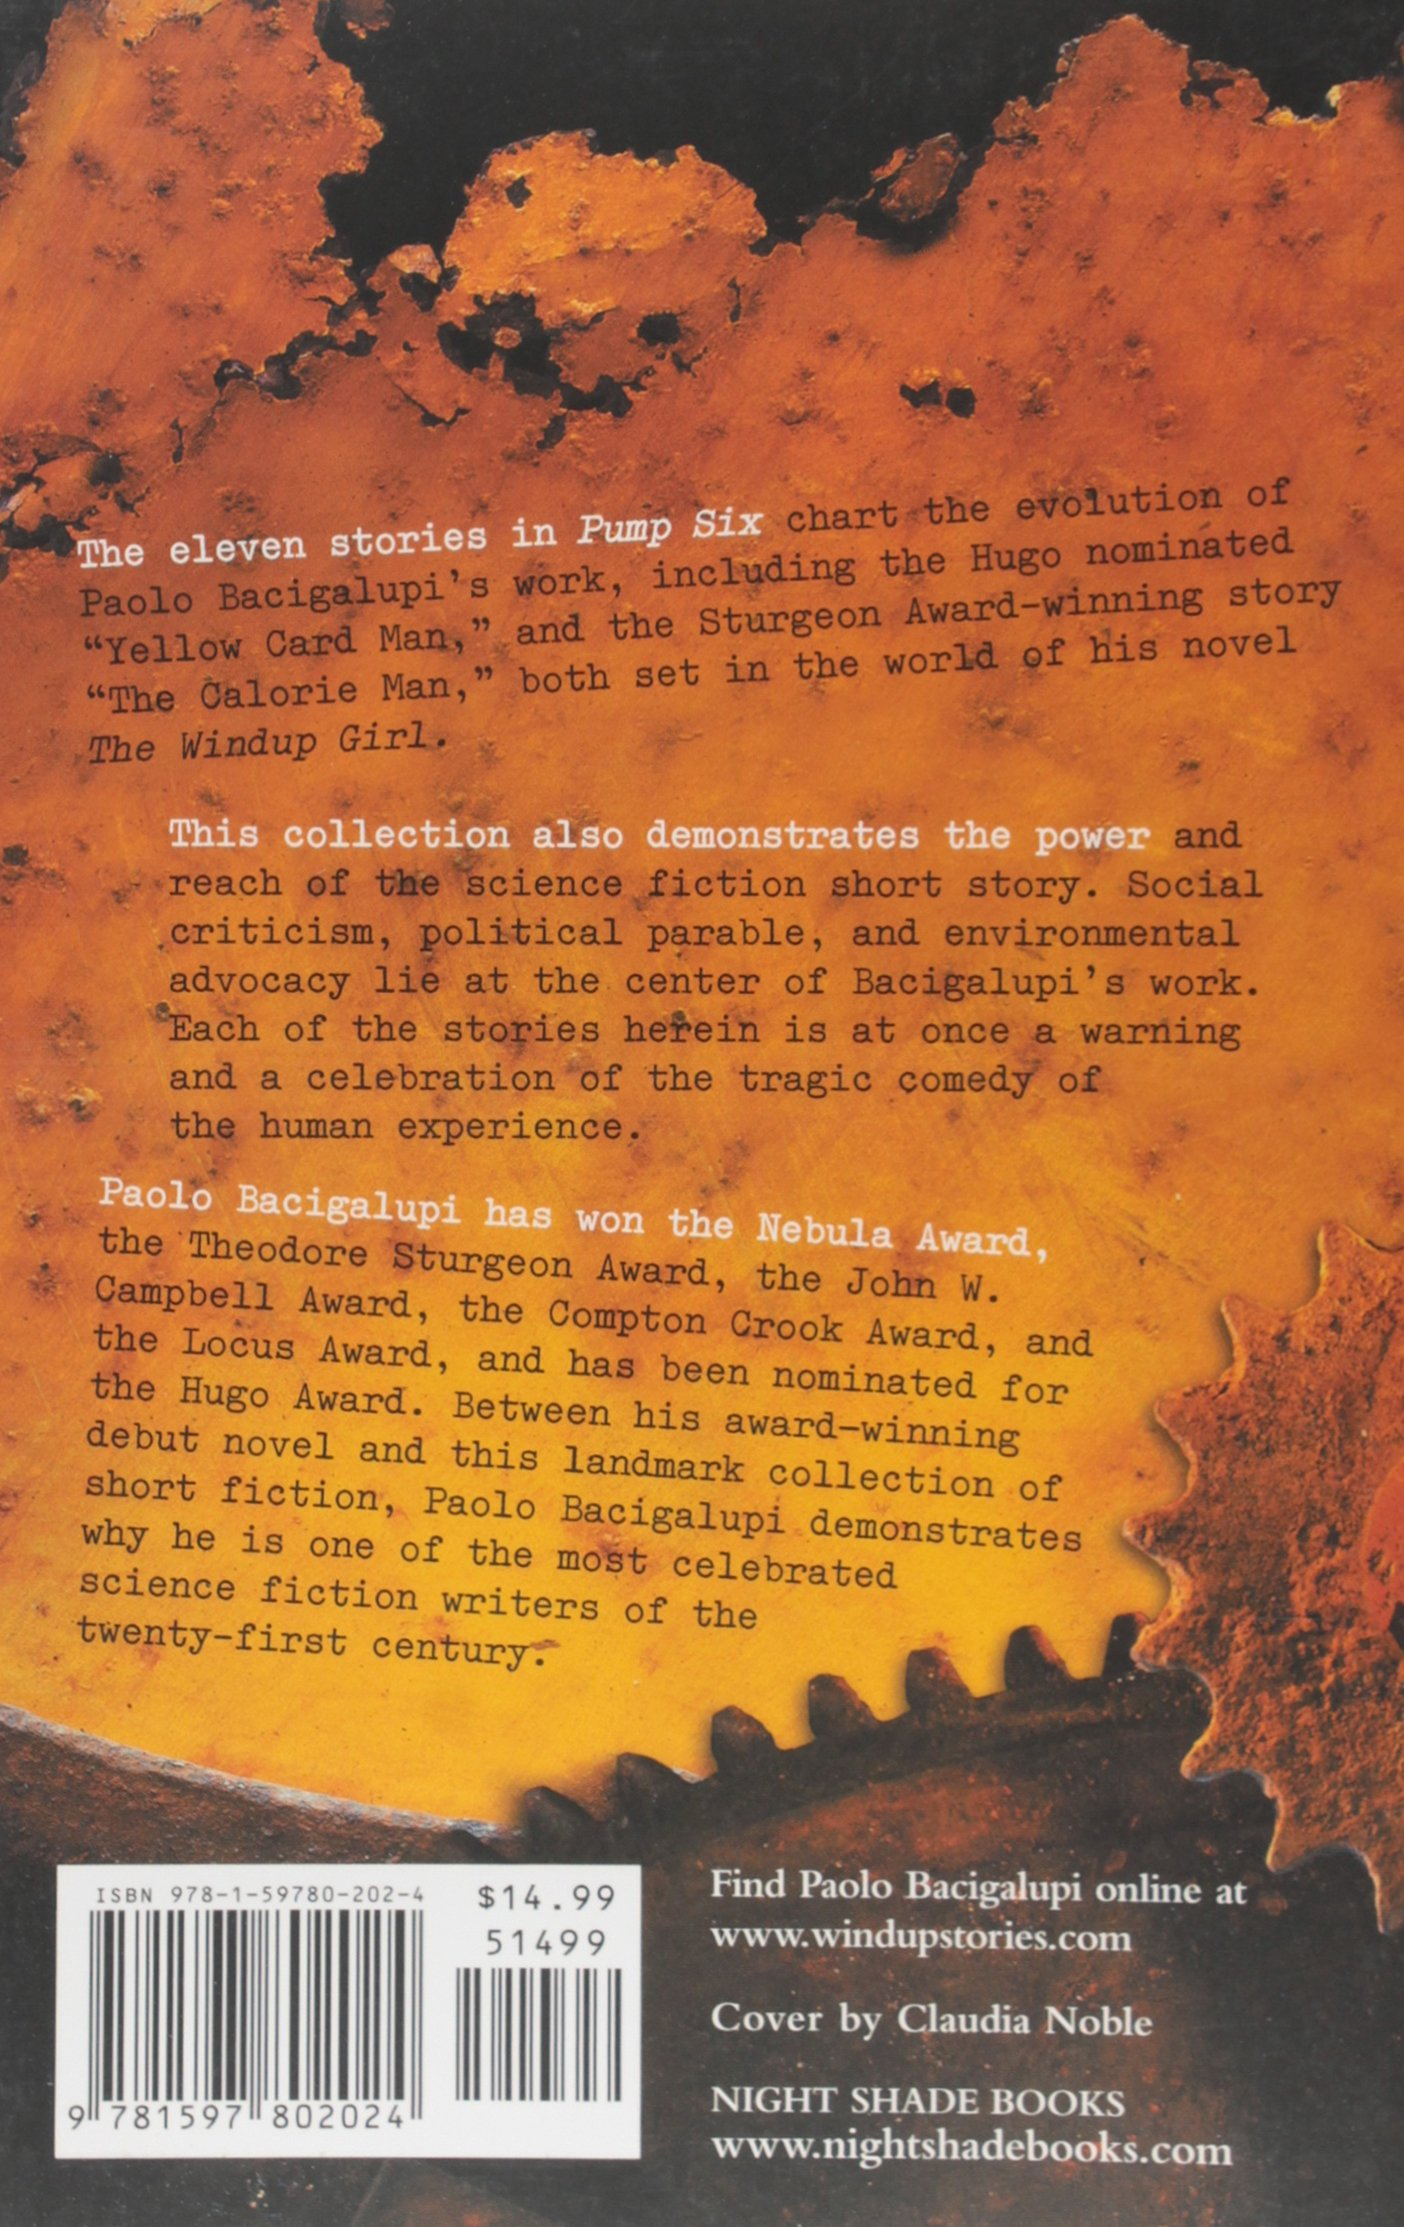 Pump Six And Other Stories: Paolo Bacigalupi: 9781597802024: Amazon:  Books